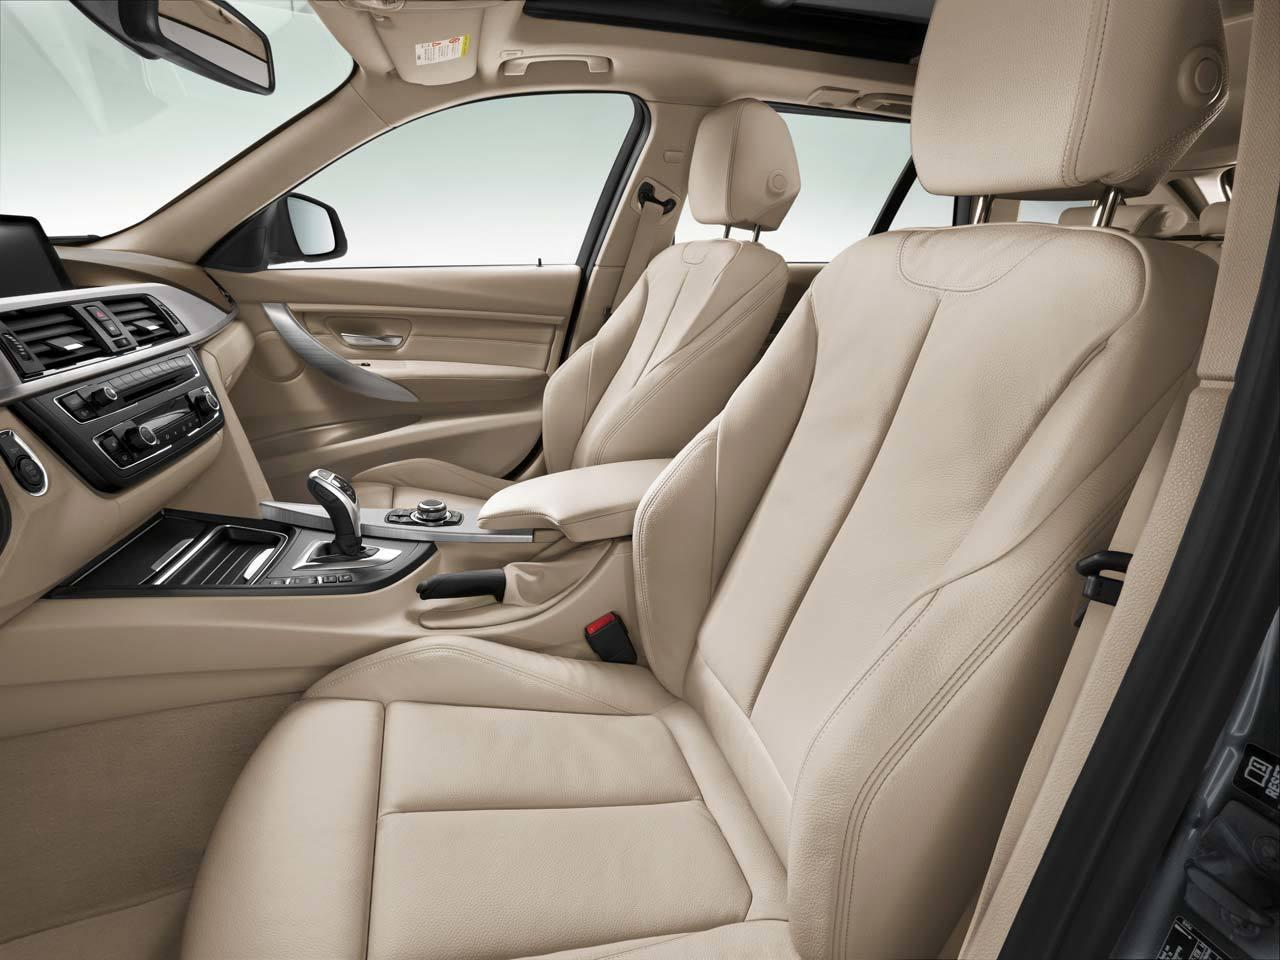 Foto de BMW Serie 3 Touring 2012 (43/43)